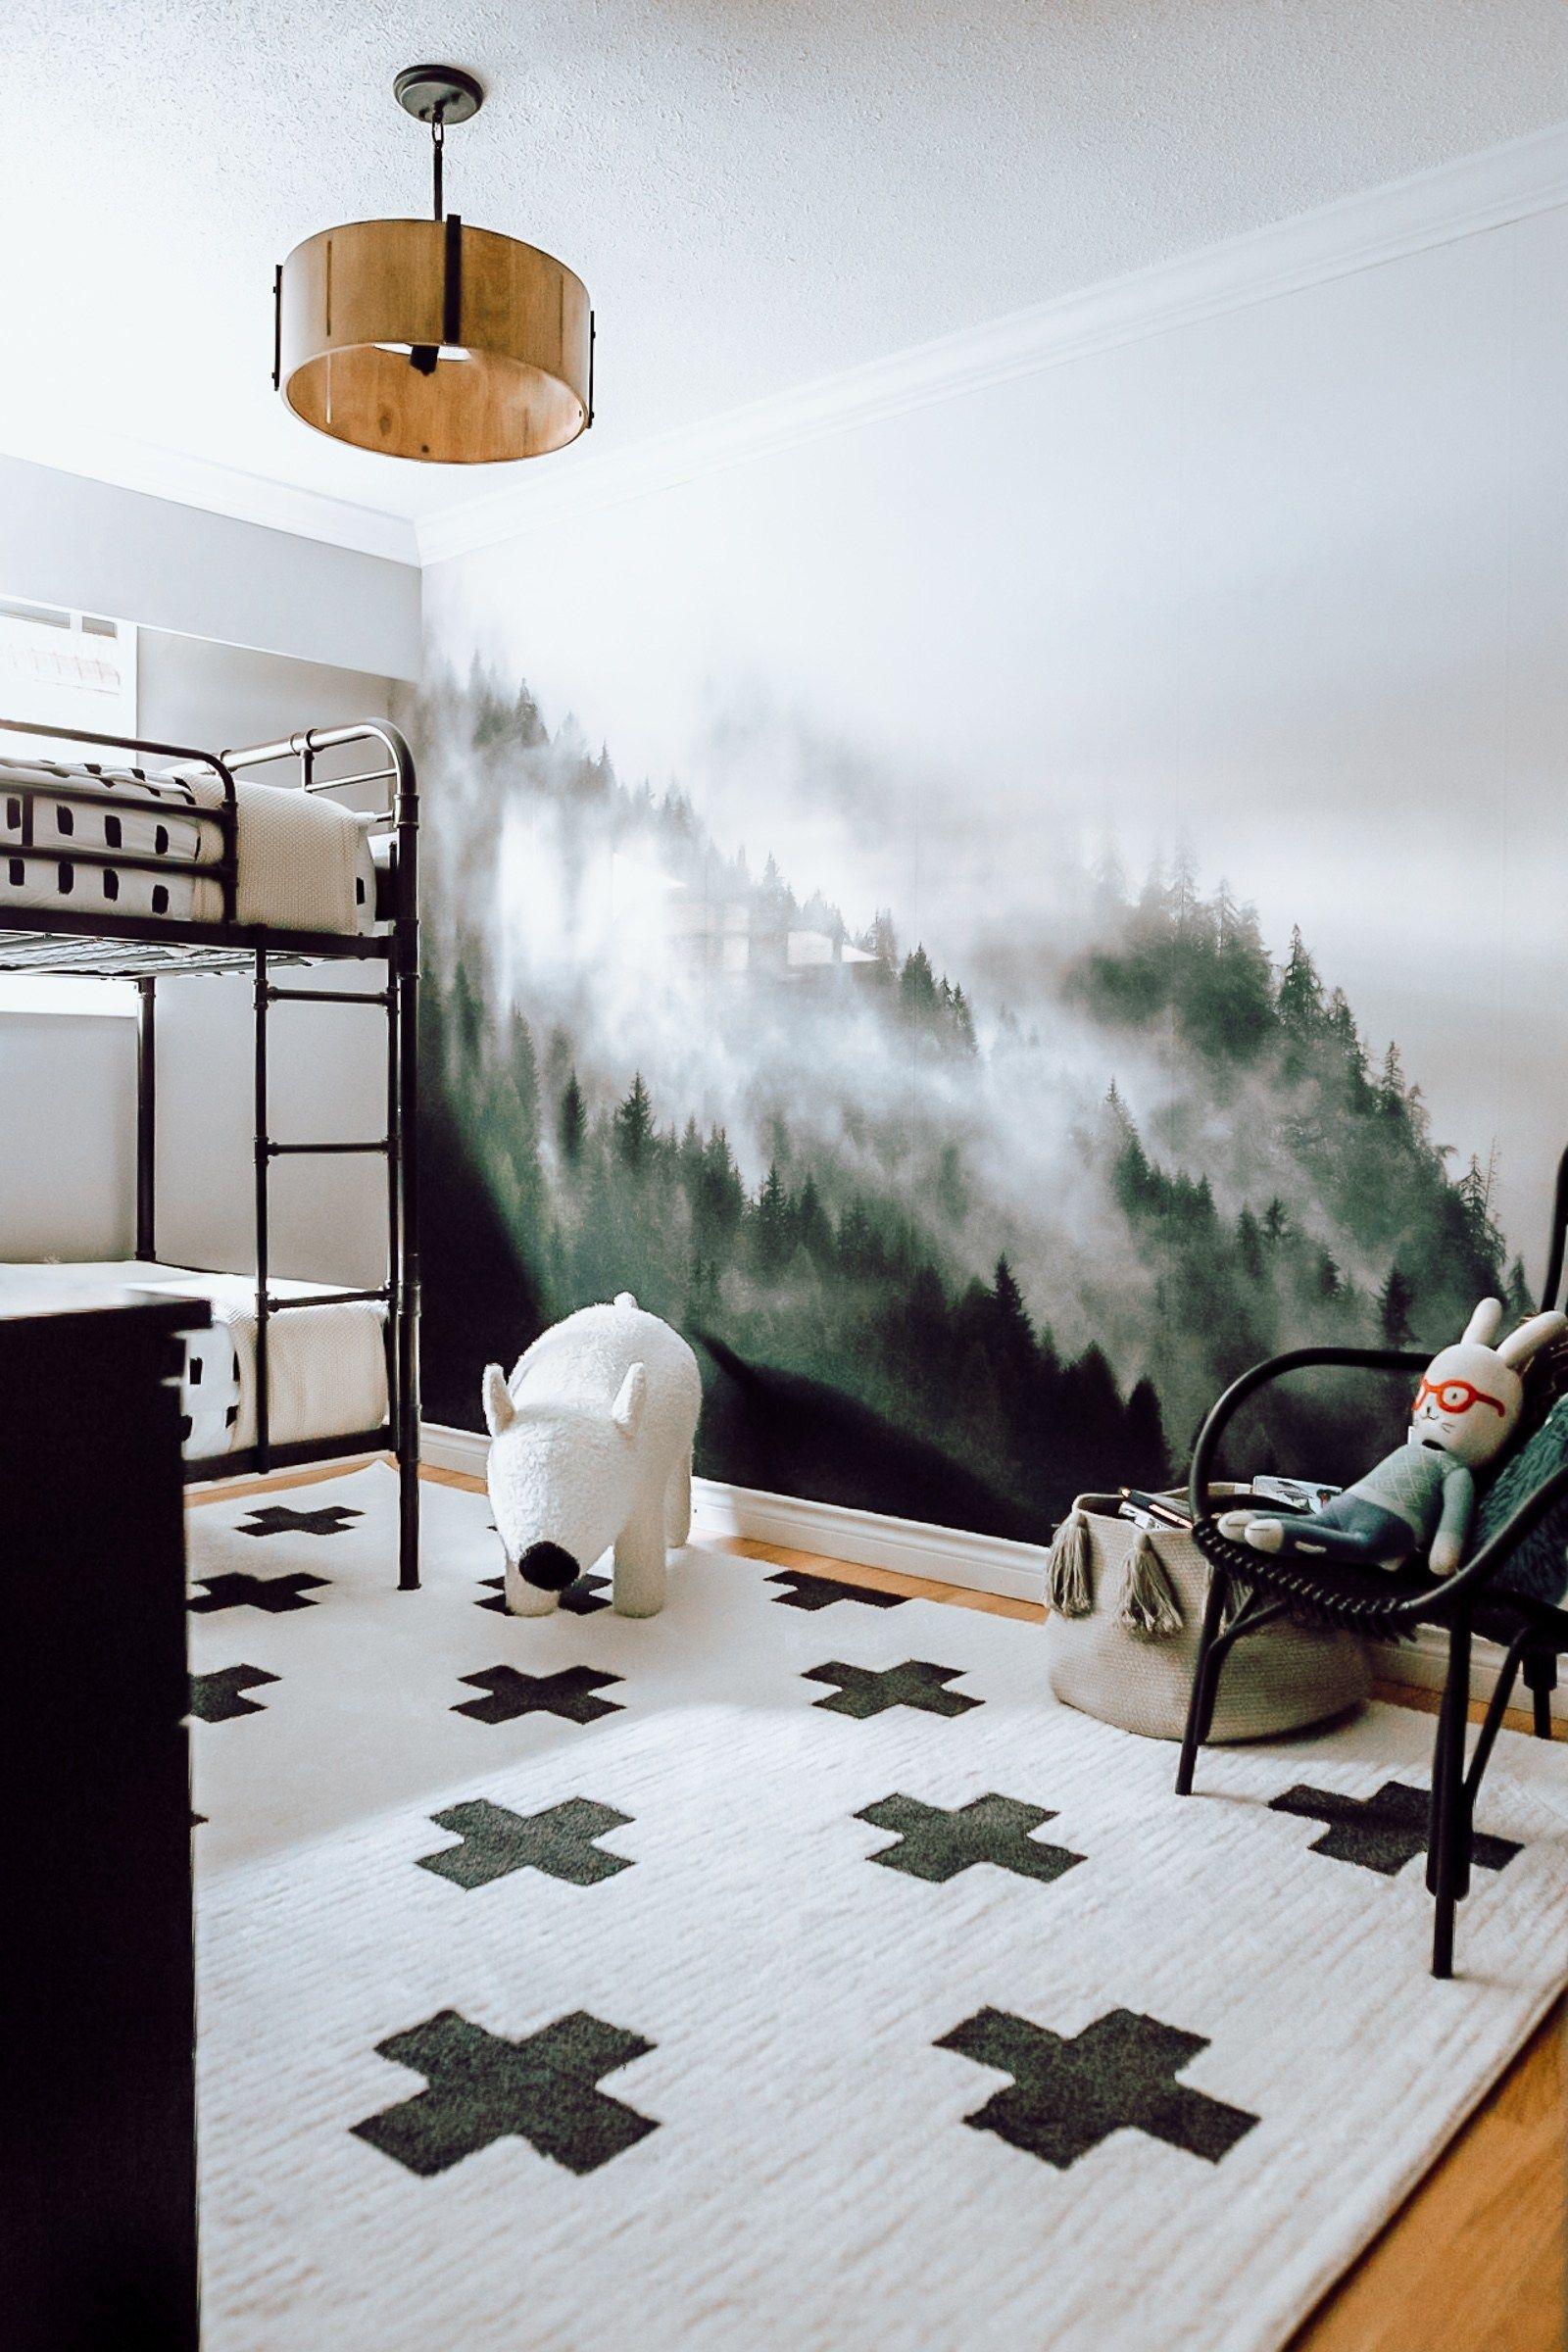 A Tween Forest Wonderland Bed bath and beyond, Amazing